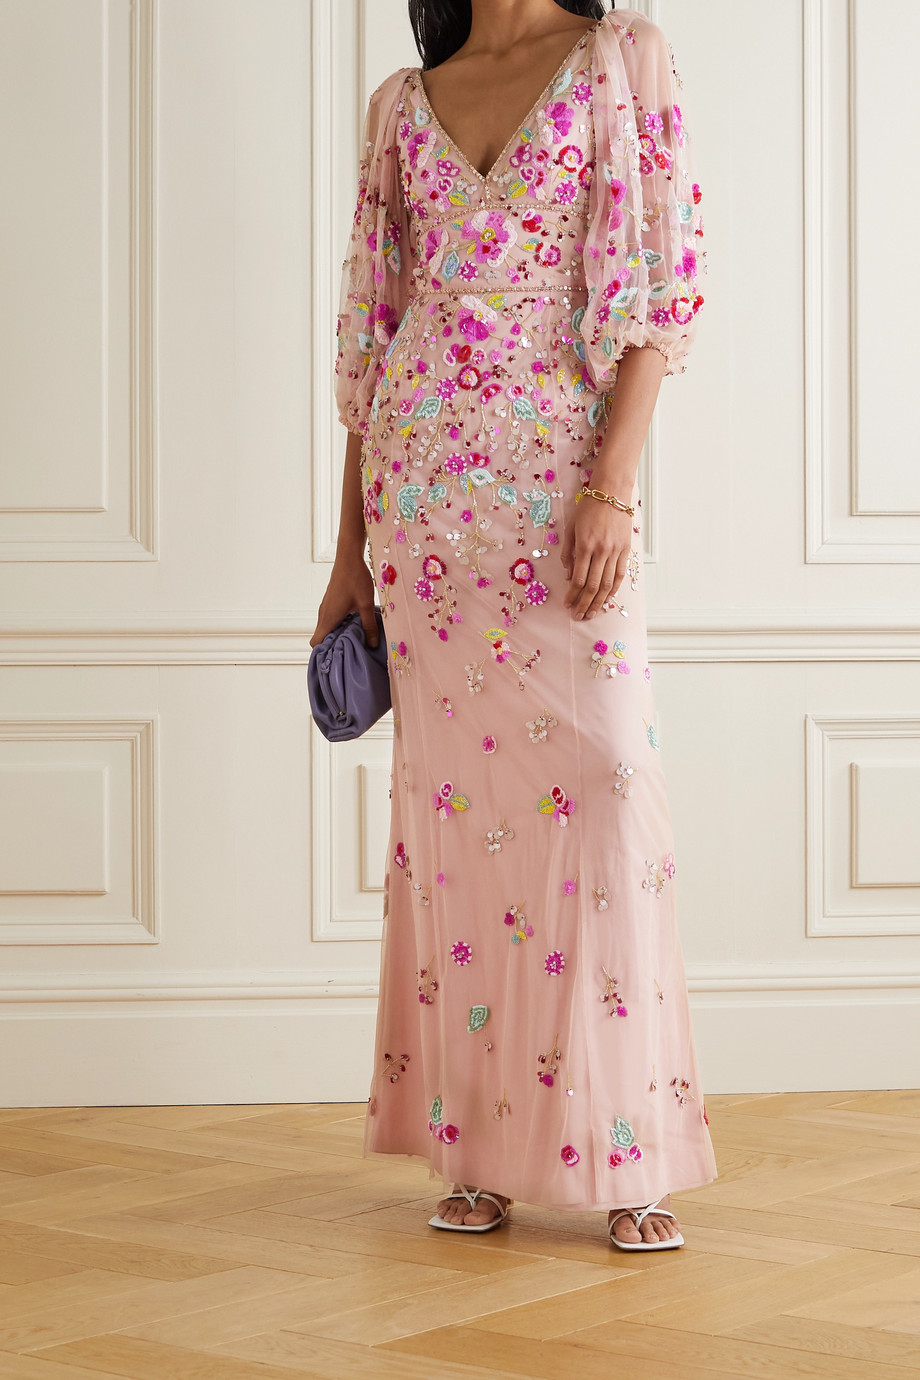 Jenny Packham Sugar Sweet embellished tulle gown